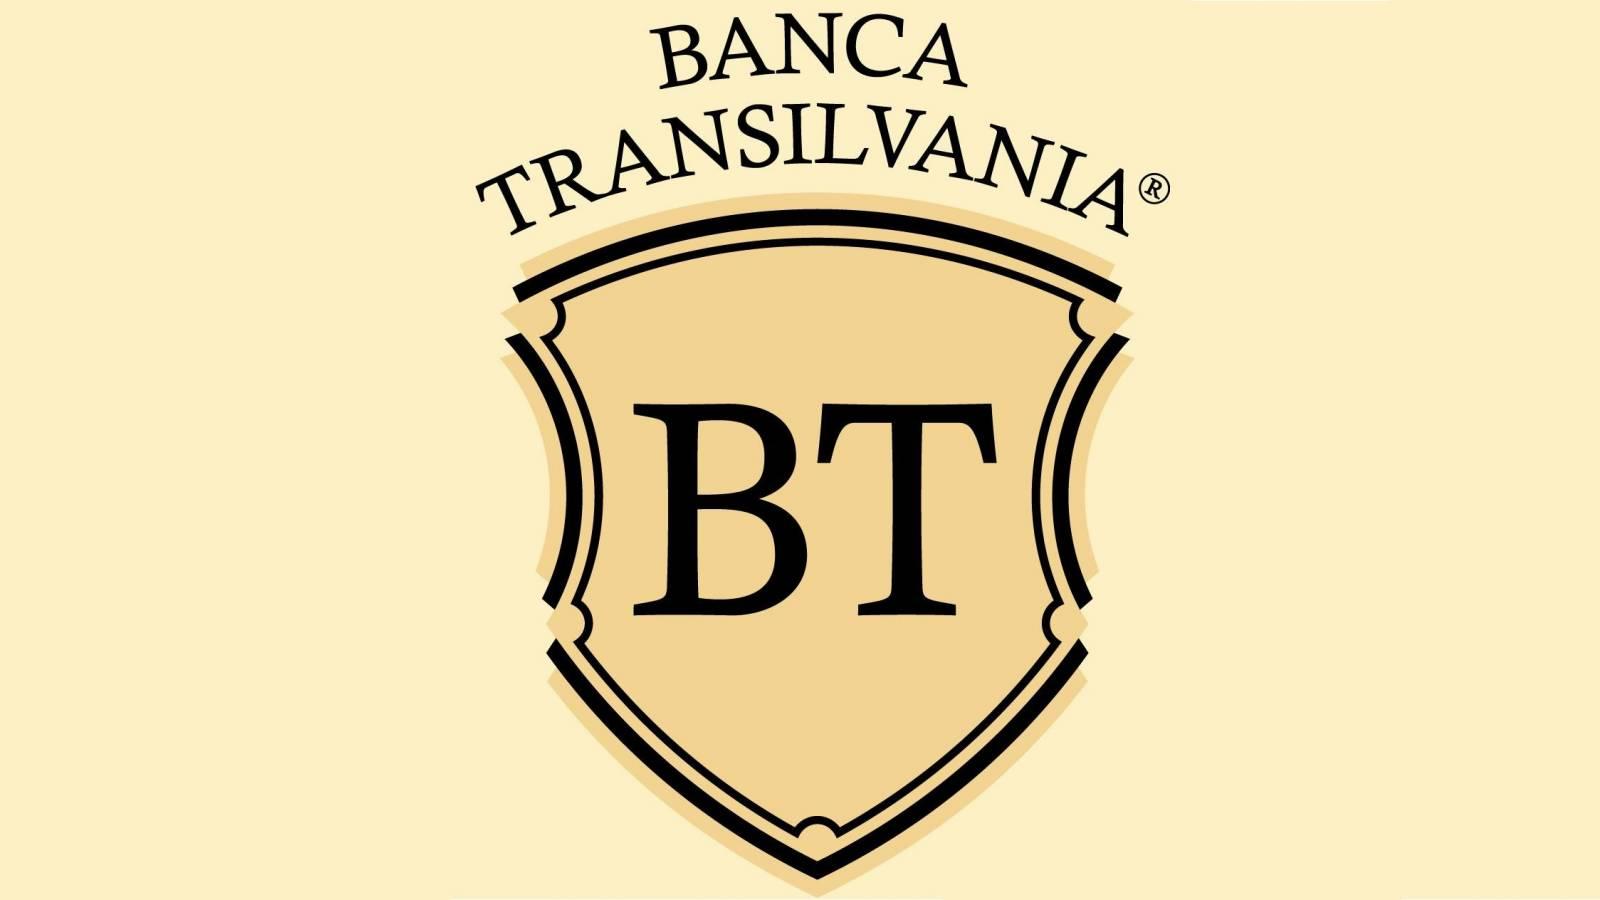 BANCA Transilvania mcdonalds